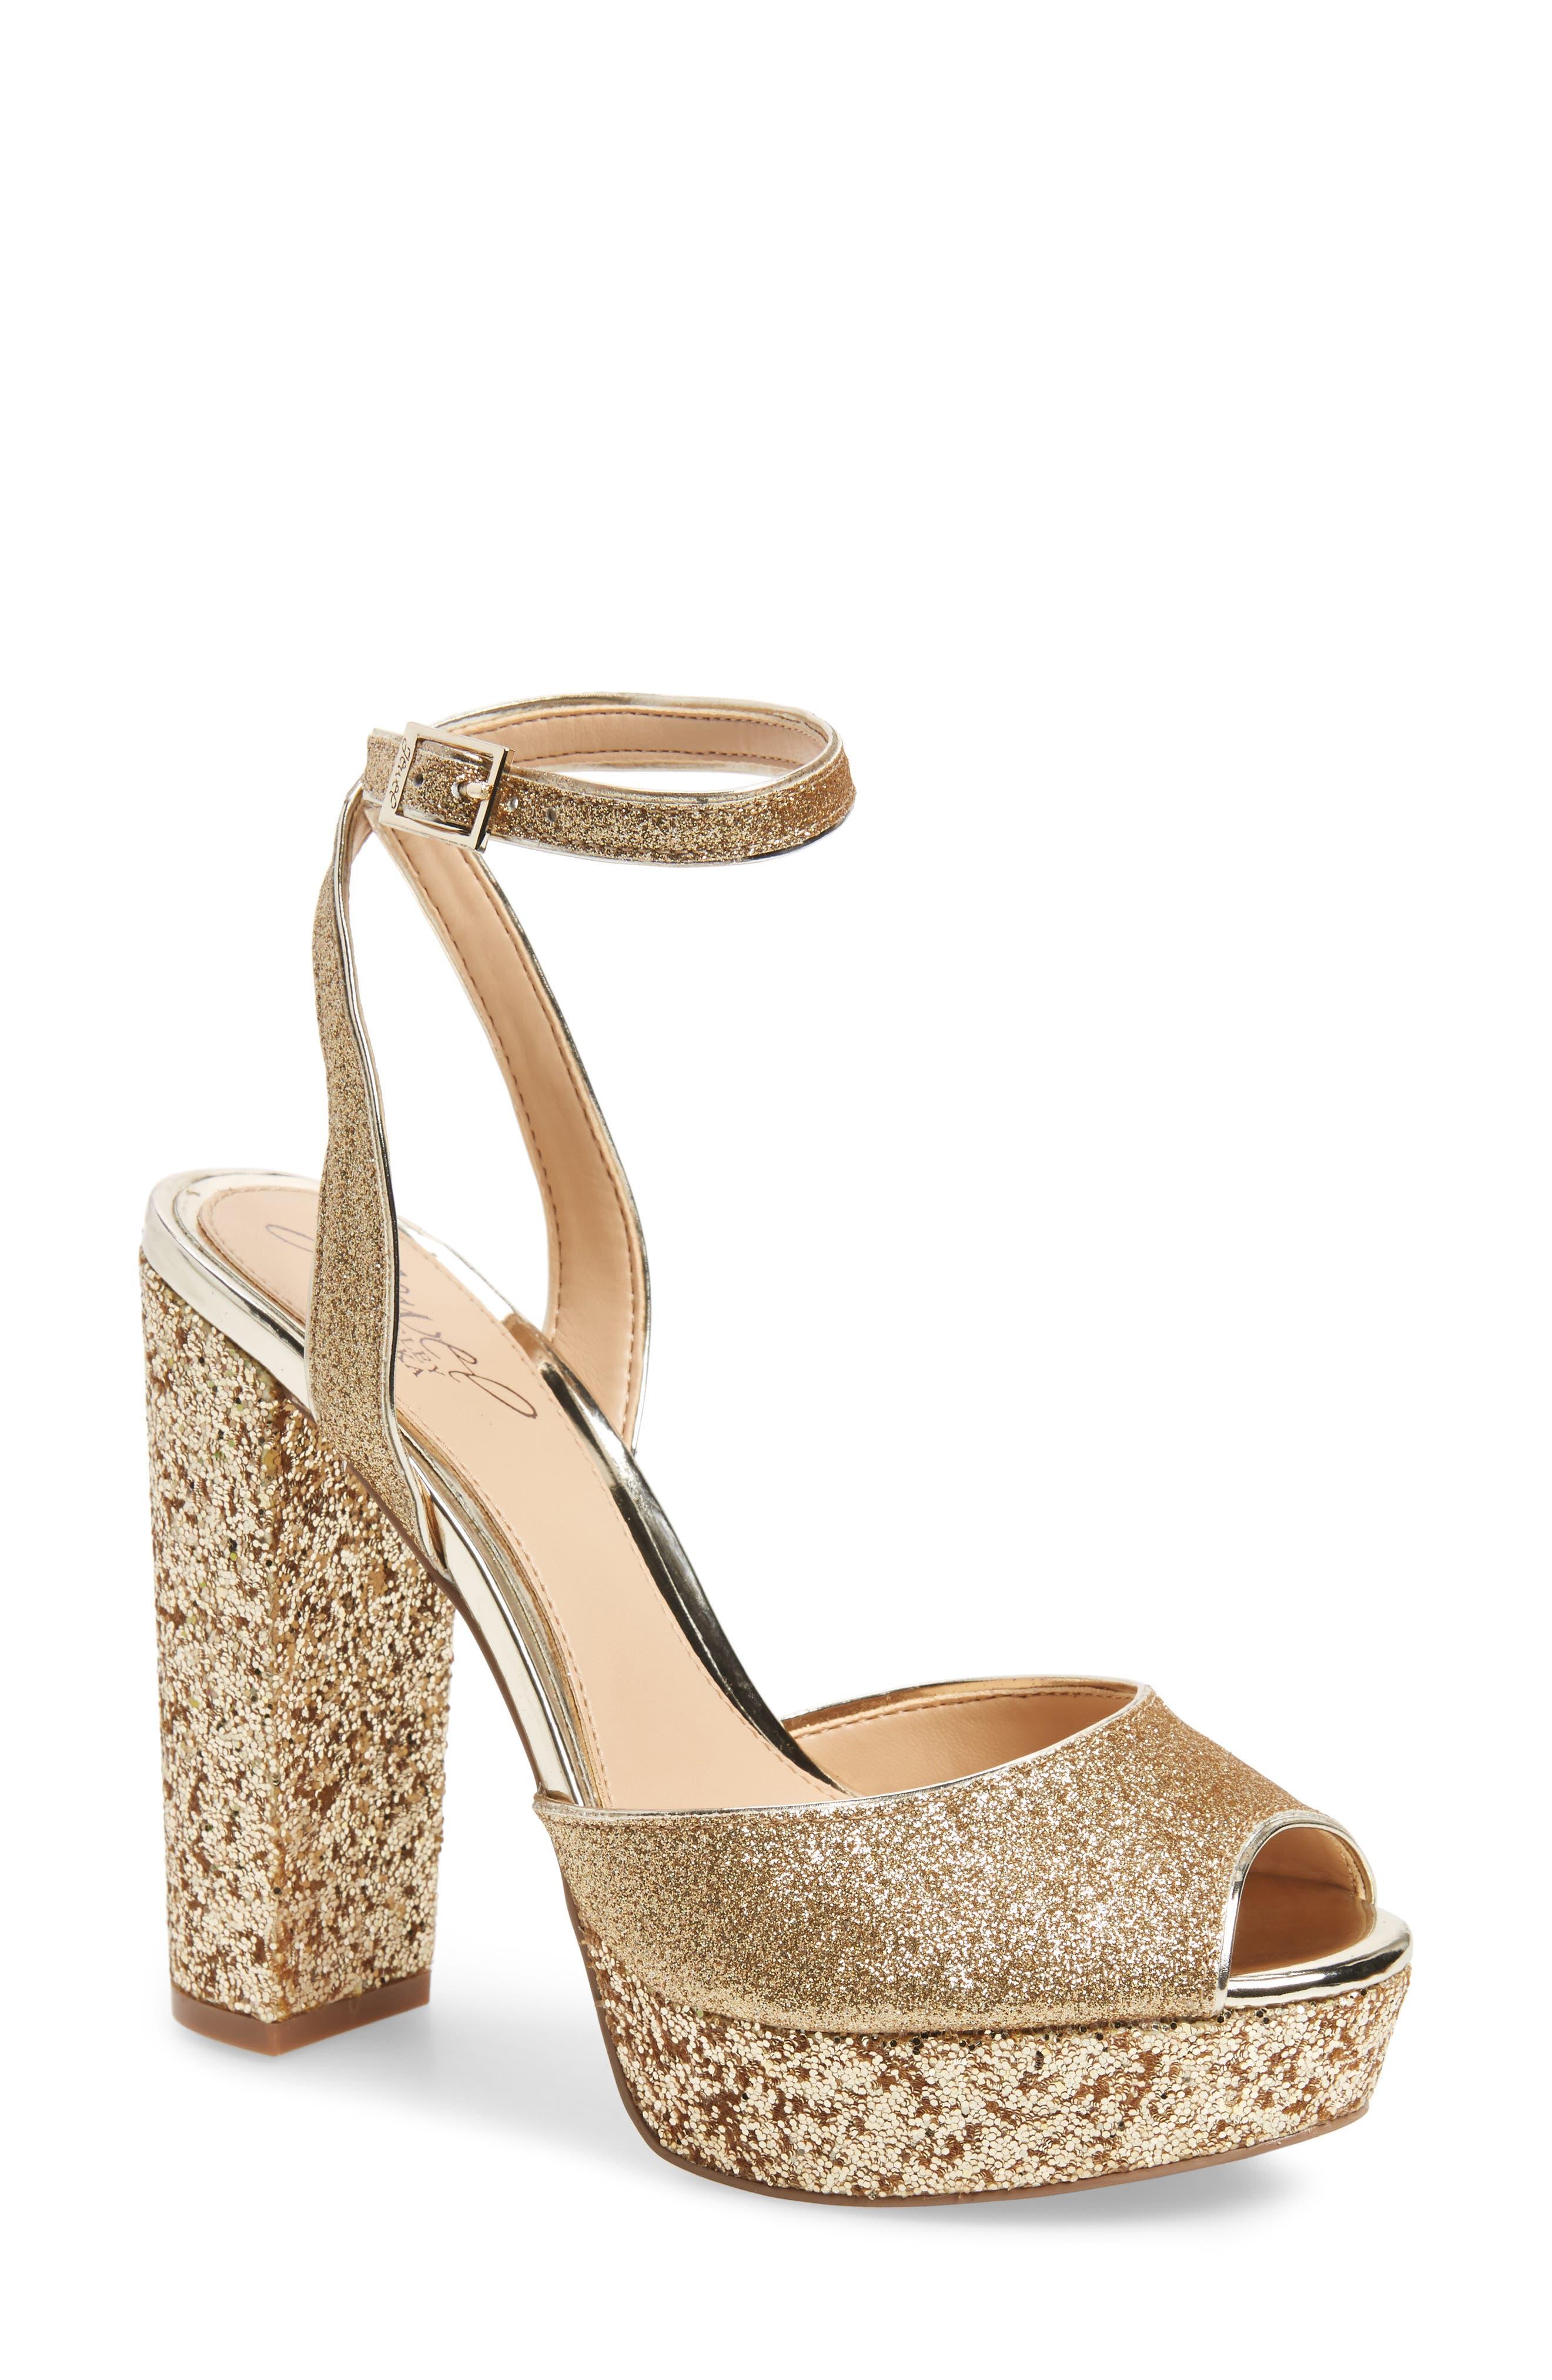 Alternate Image 1 Selected - Jewel Badgley Mischka Luke Platform Sandal (Women)